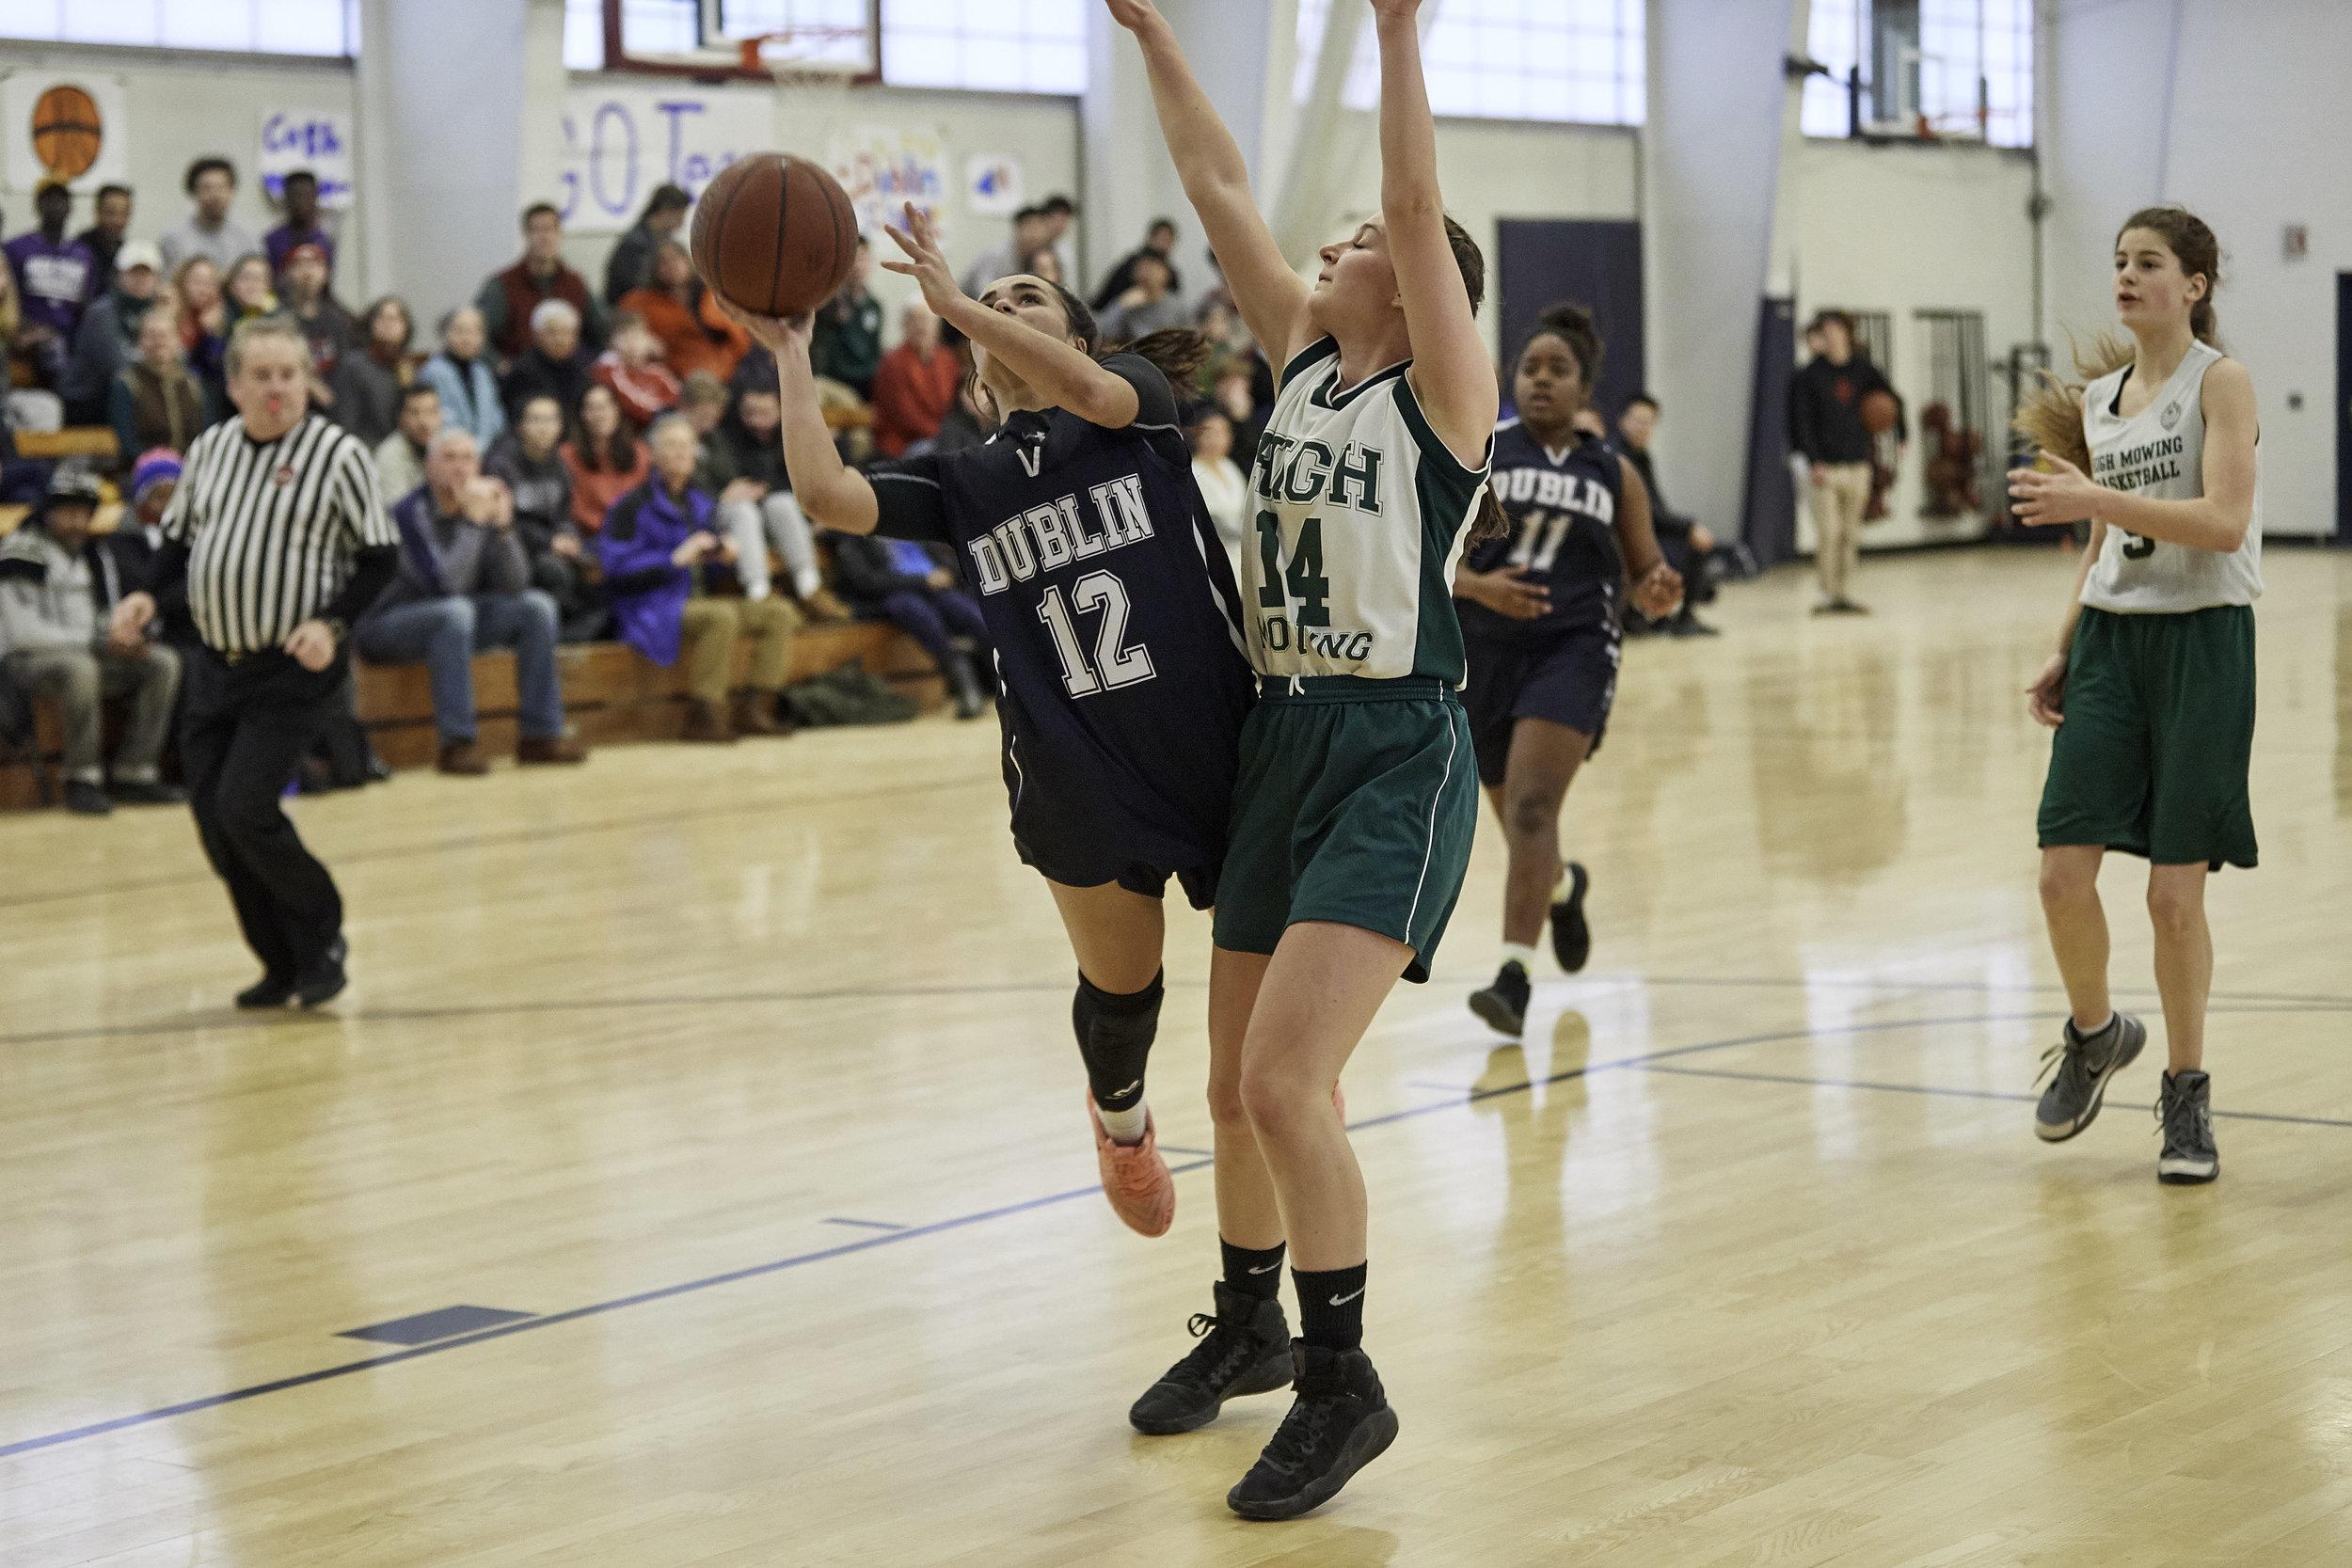 Basketball vs High Mowing School, February 2, 2019 - 166502.jpg